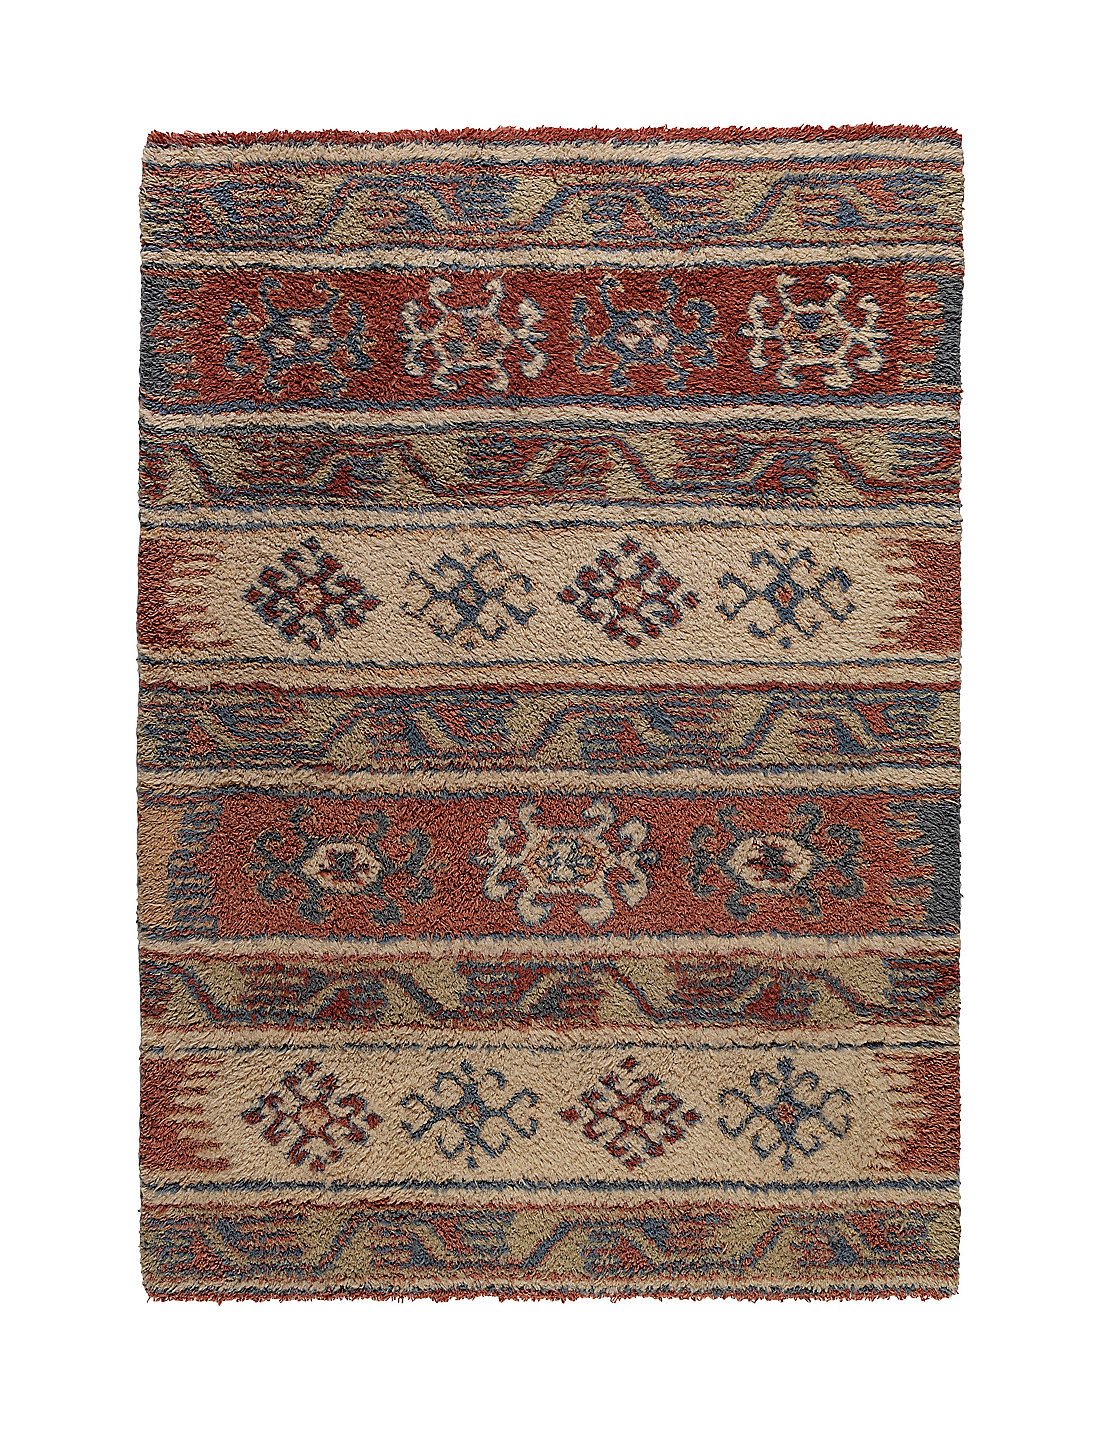 anatolian tribal print rug   m&s